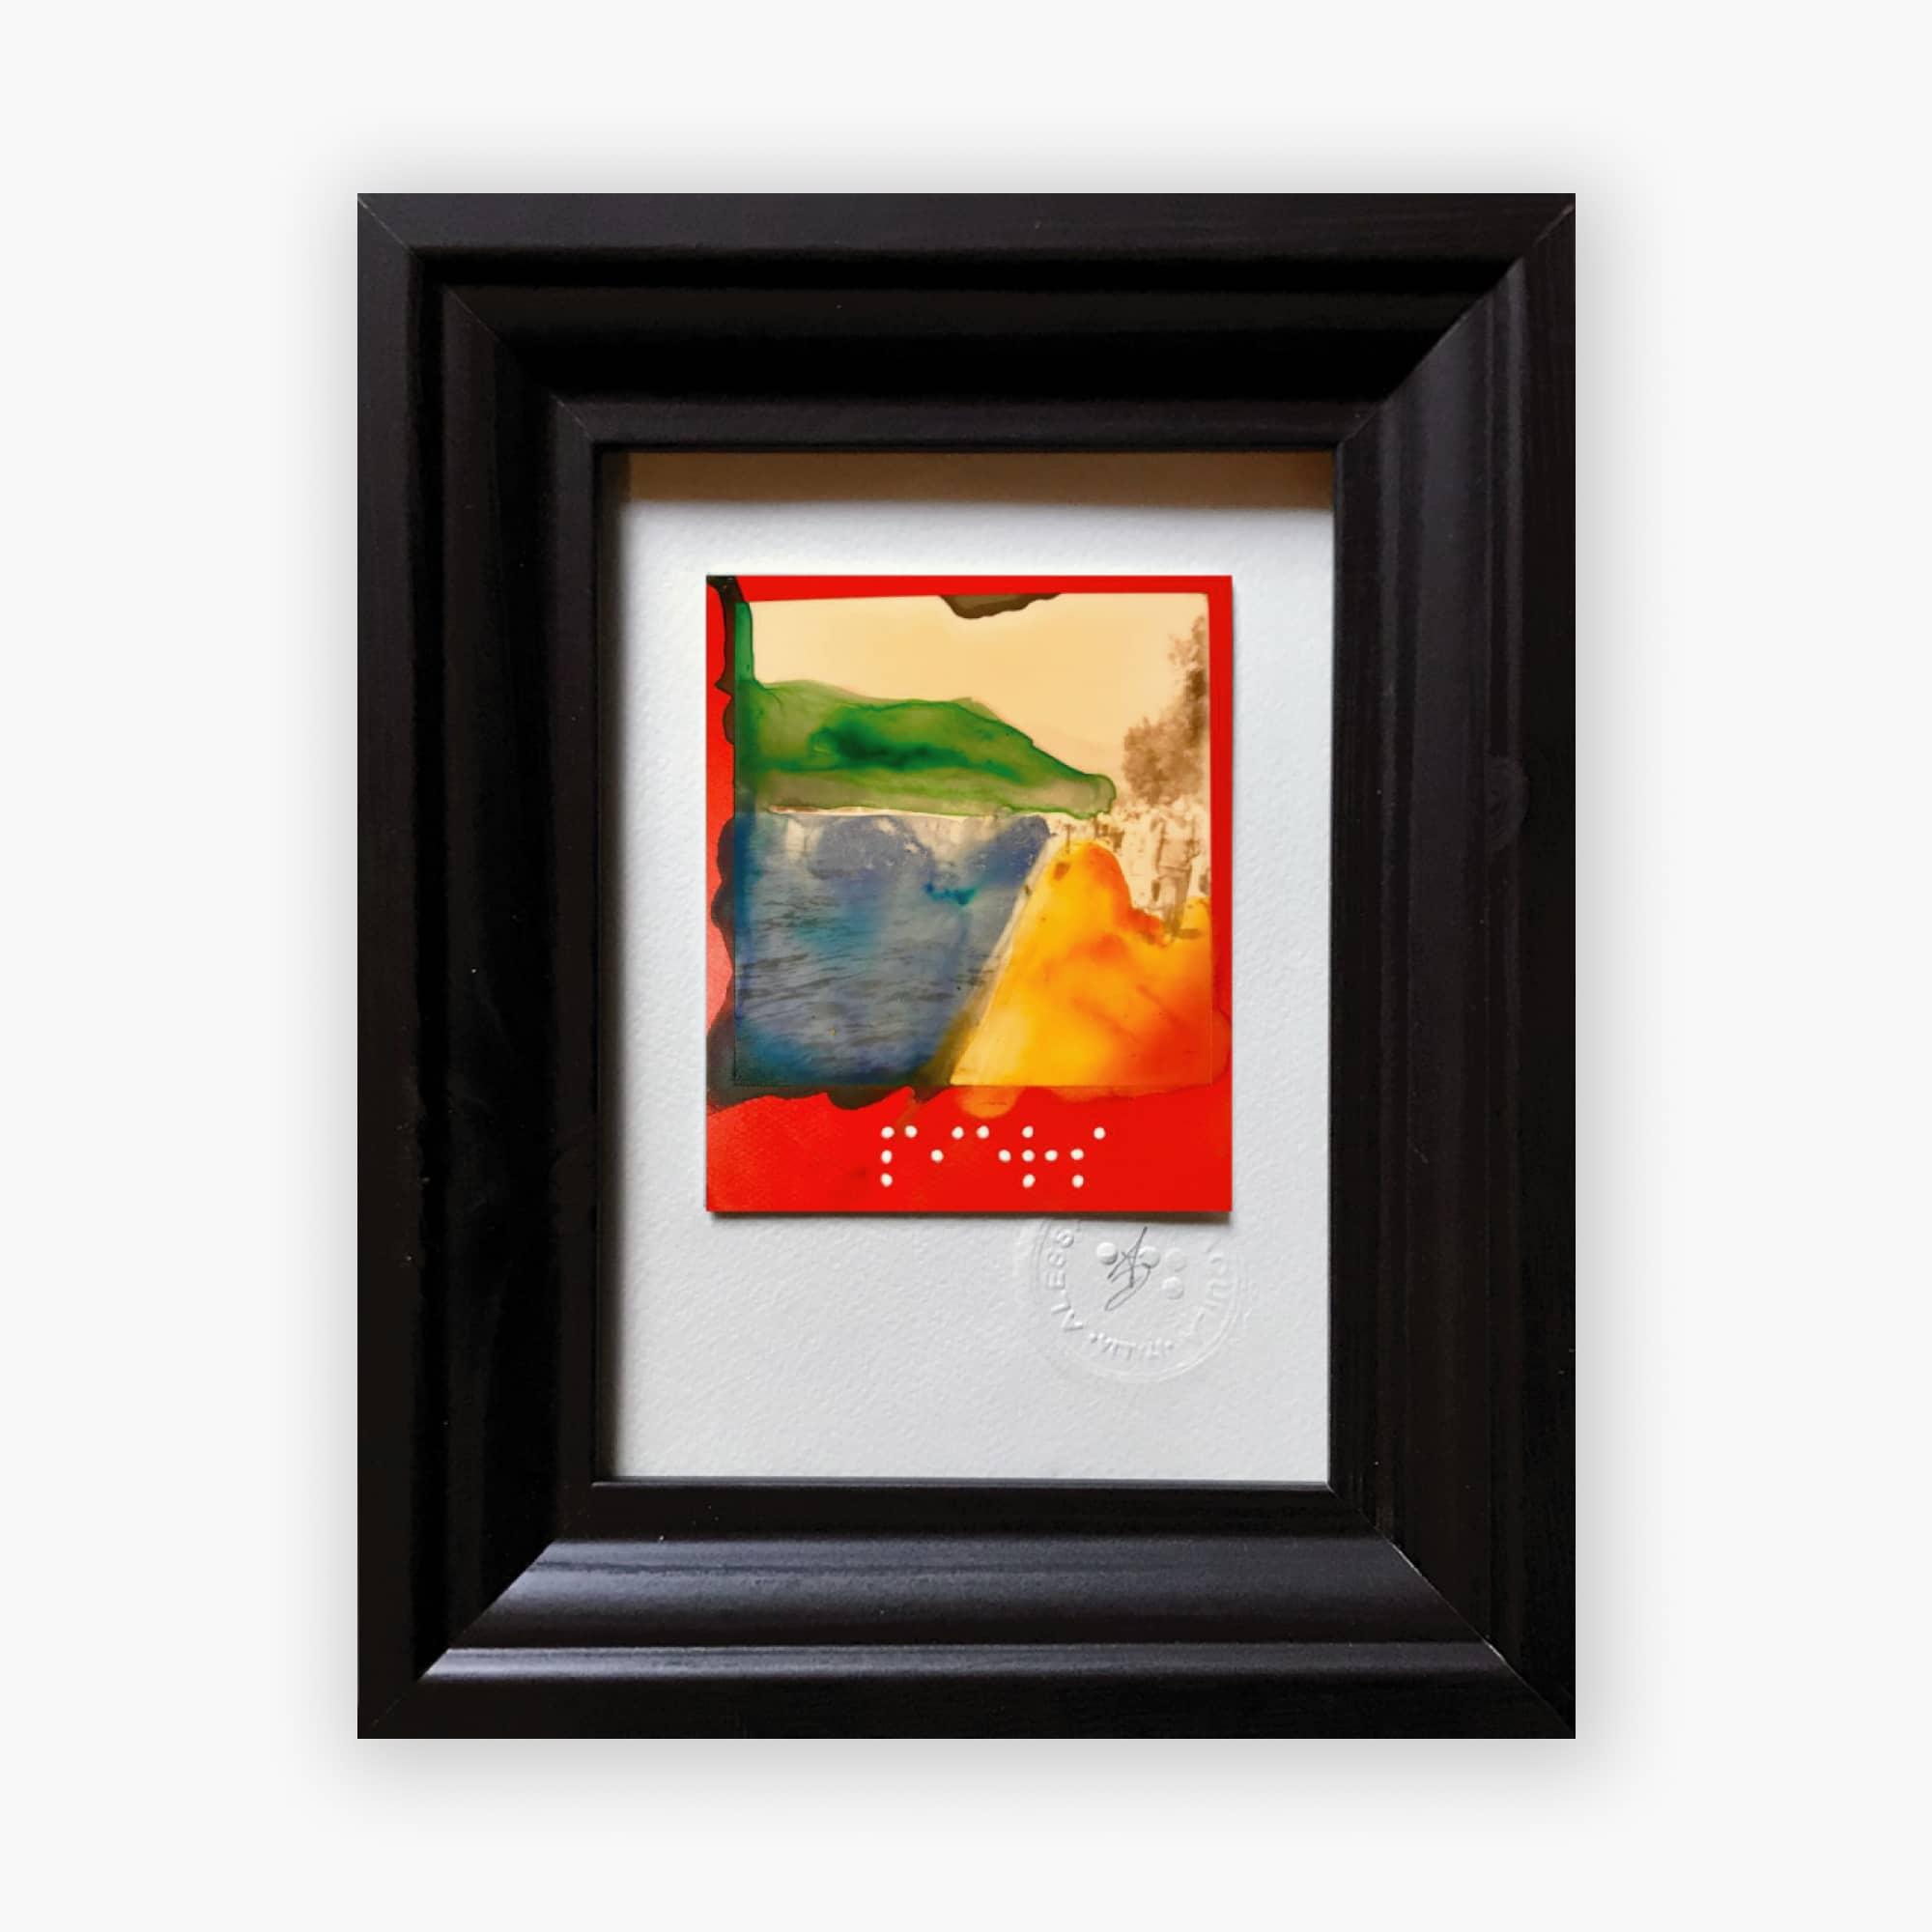 The Floating Polaroid #17